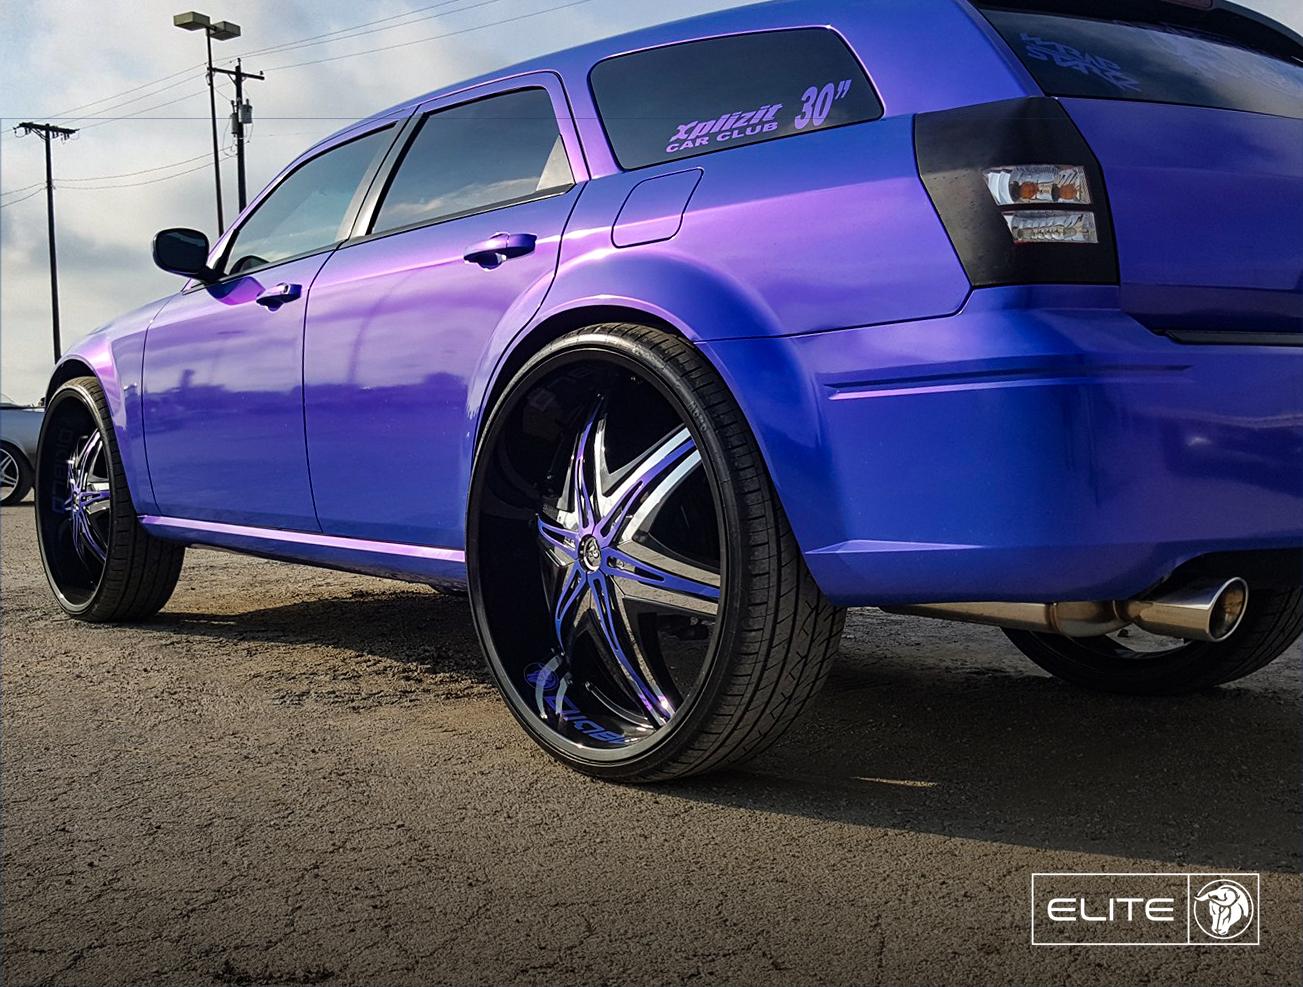 Diablo Wheels - Elite on a Dodge Magnum Purple